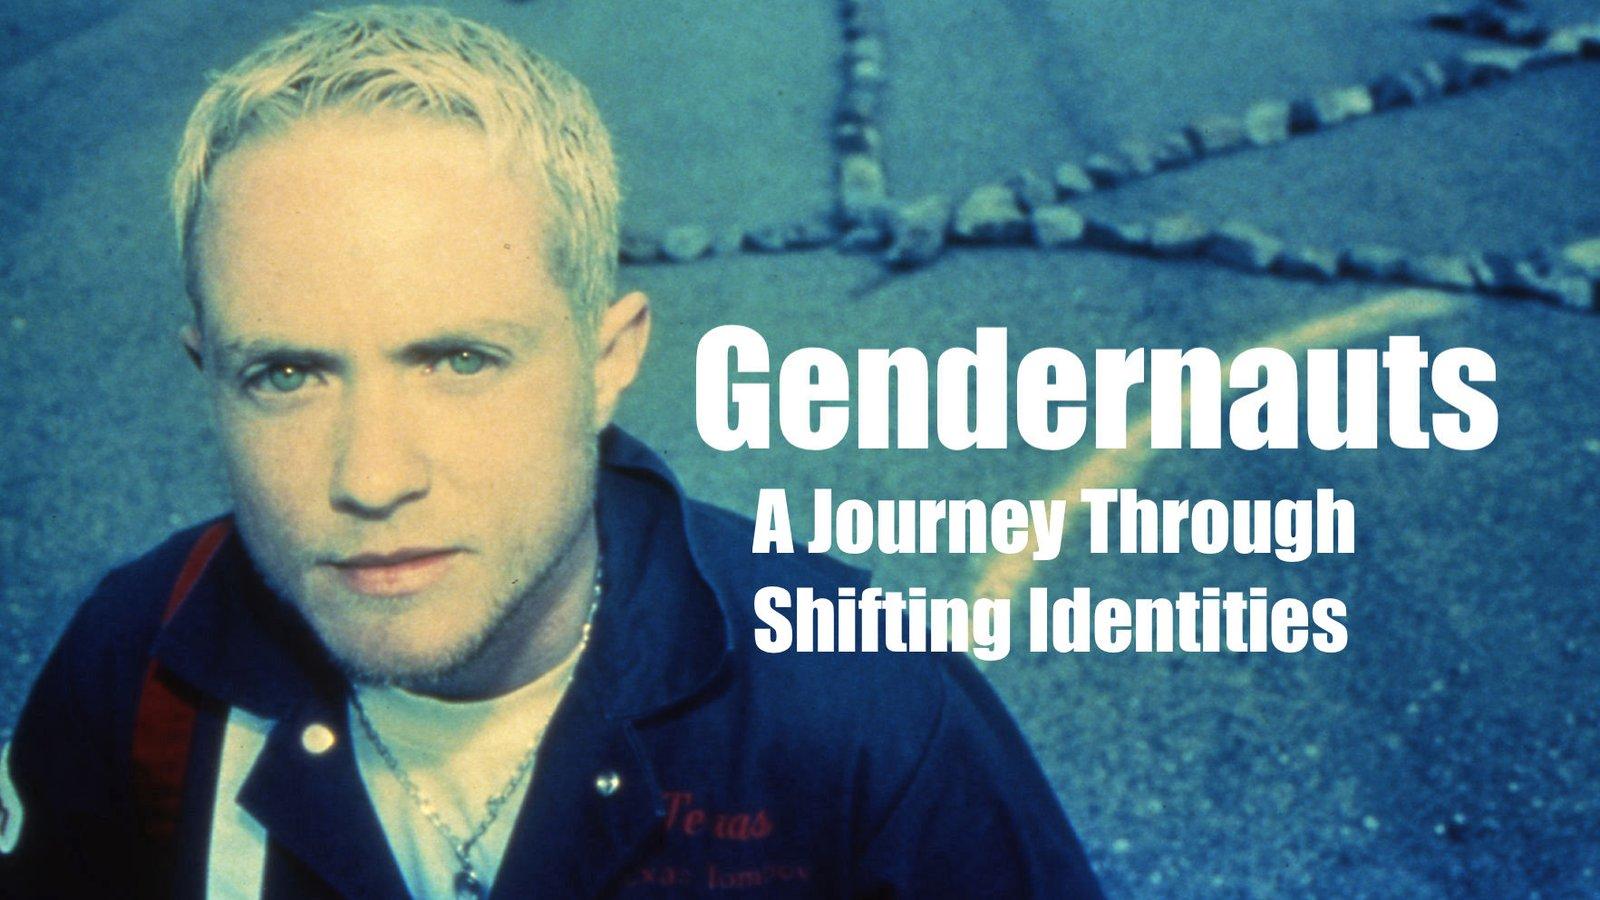 Gendernauts: A Journey Through Shifting Identities